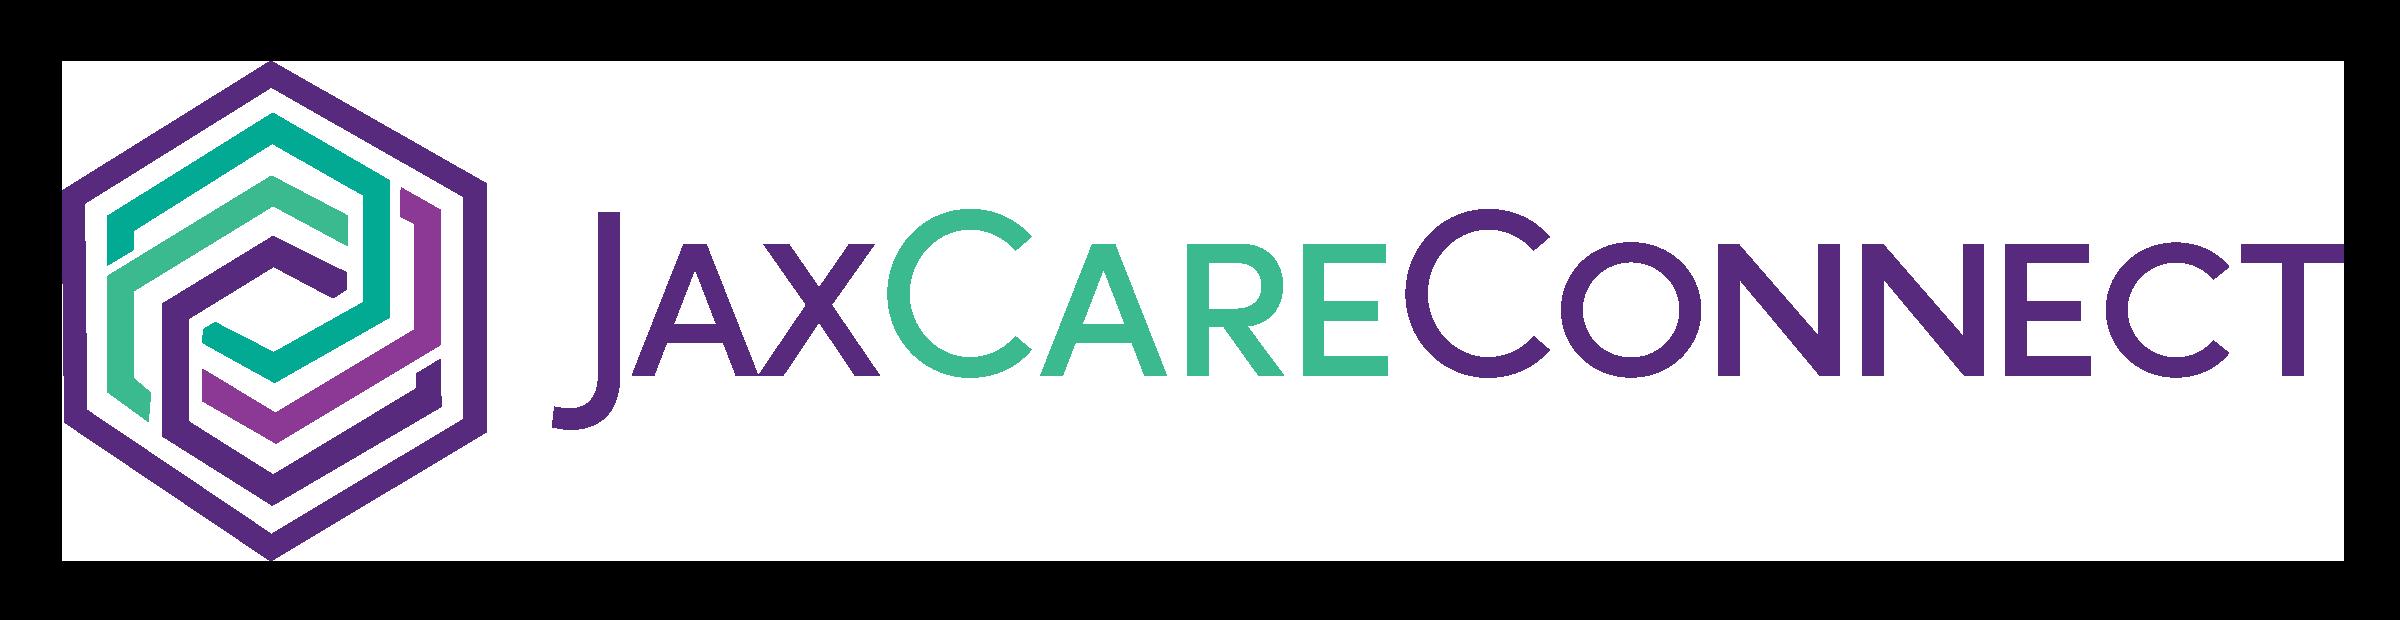 JaxCareConnect-Logo-Color-horiz